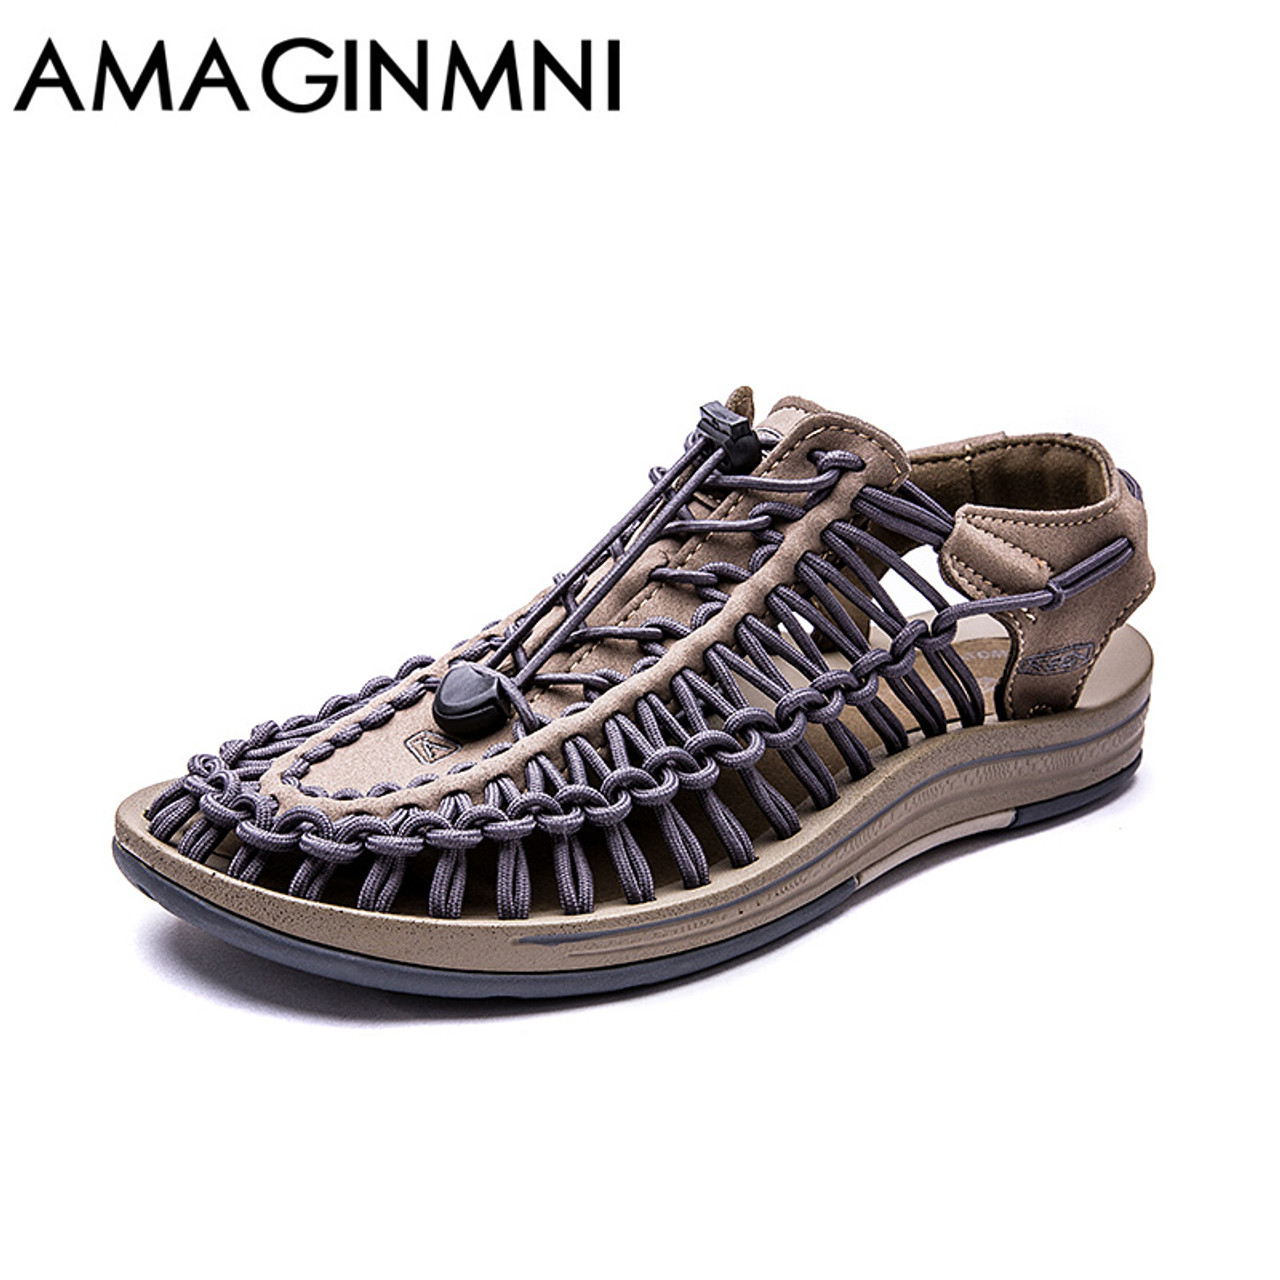 b78608df4d63 AMAGINMNI New arrived summer sandals men shoes quality comfortable men  sandals fashion design casual men sandals ...